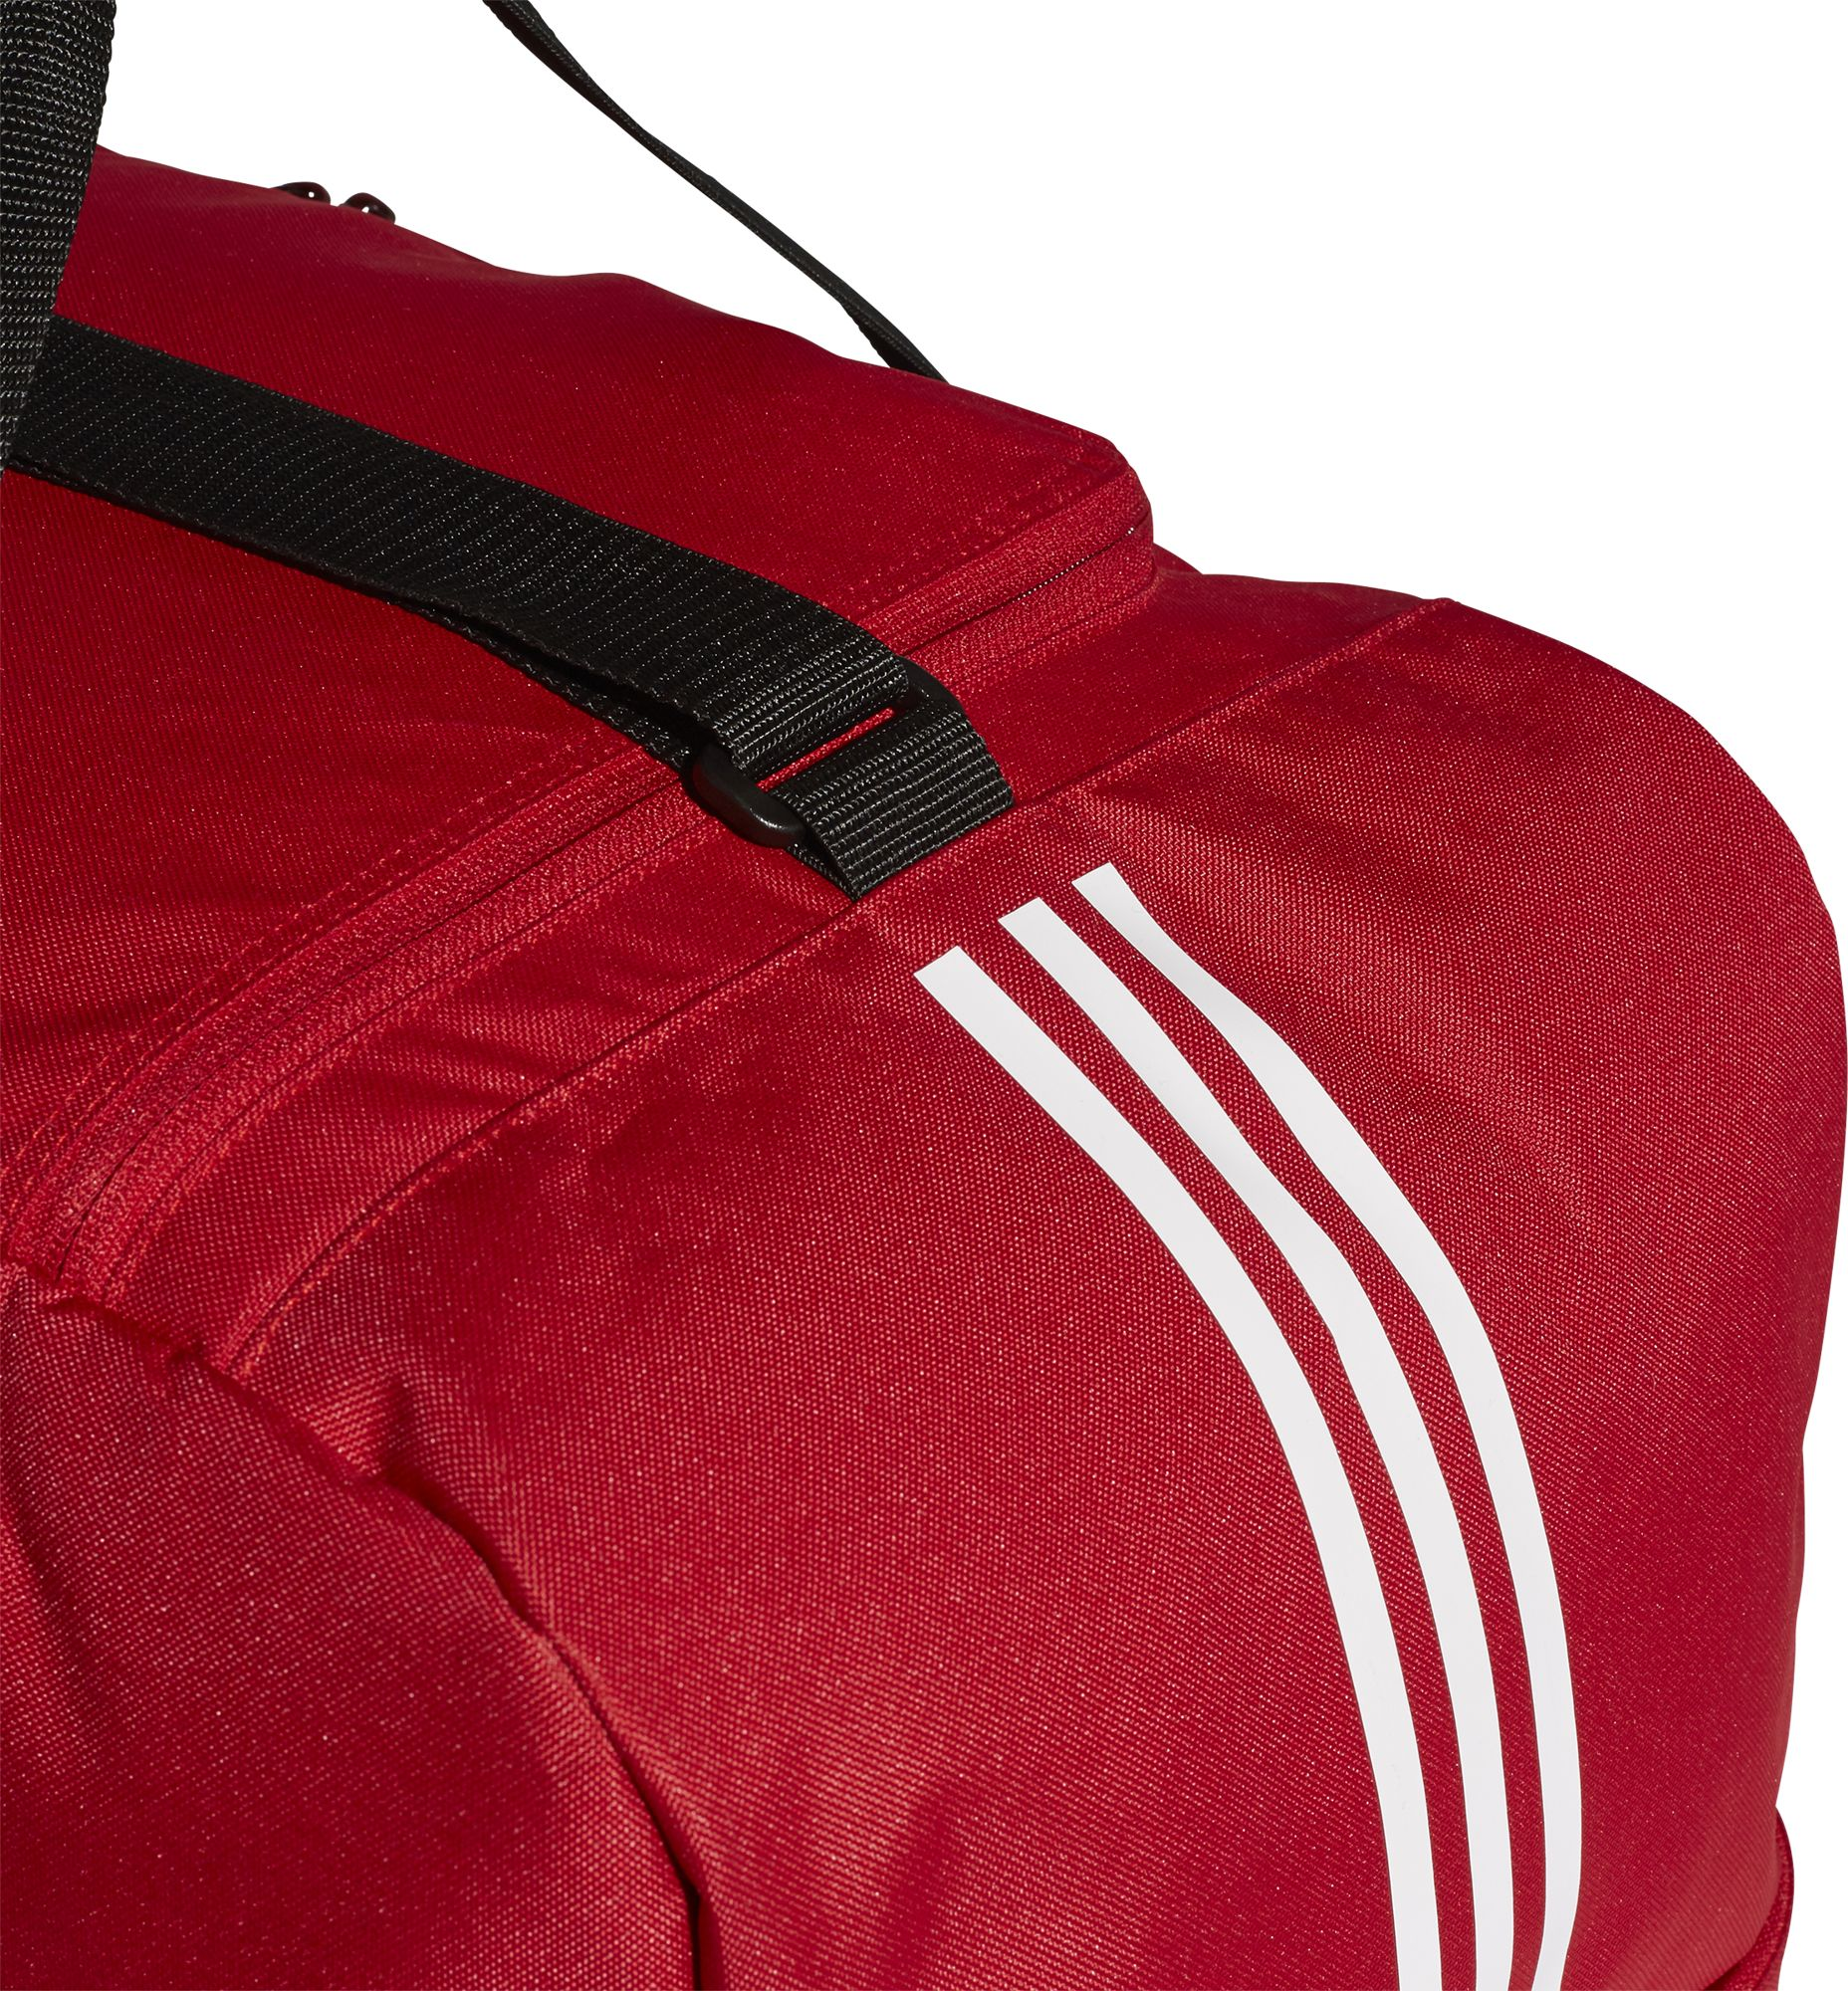 33fd4552953 Adidas Tiro 19 (Large) Sporttas Met Bodemvak | Rood / Wit | Teamswear